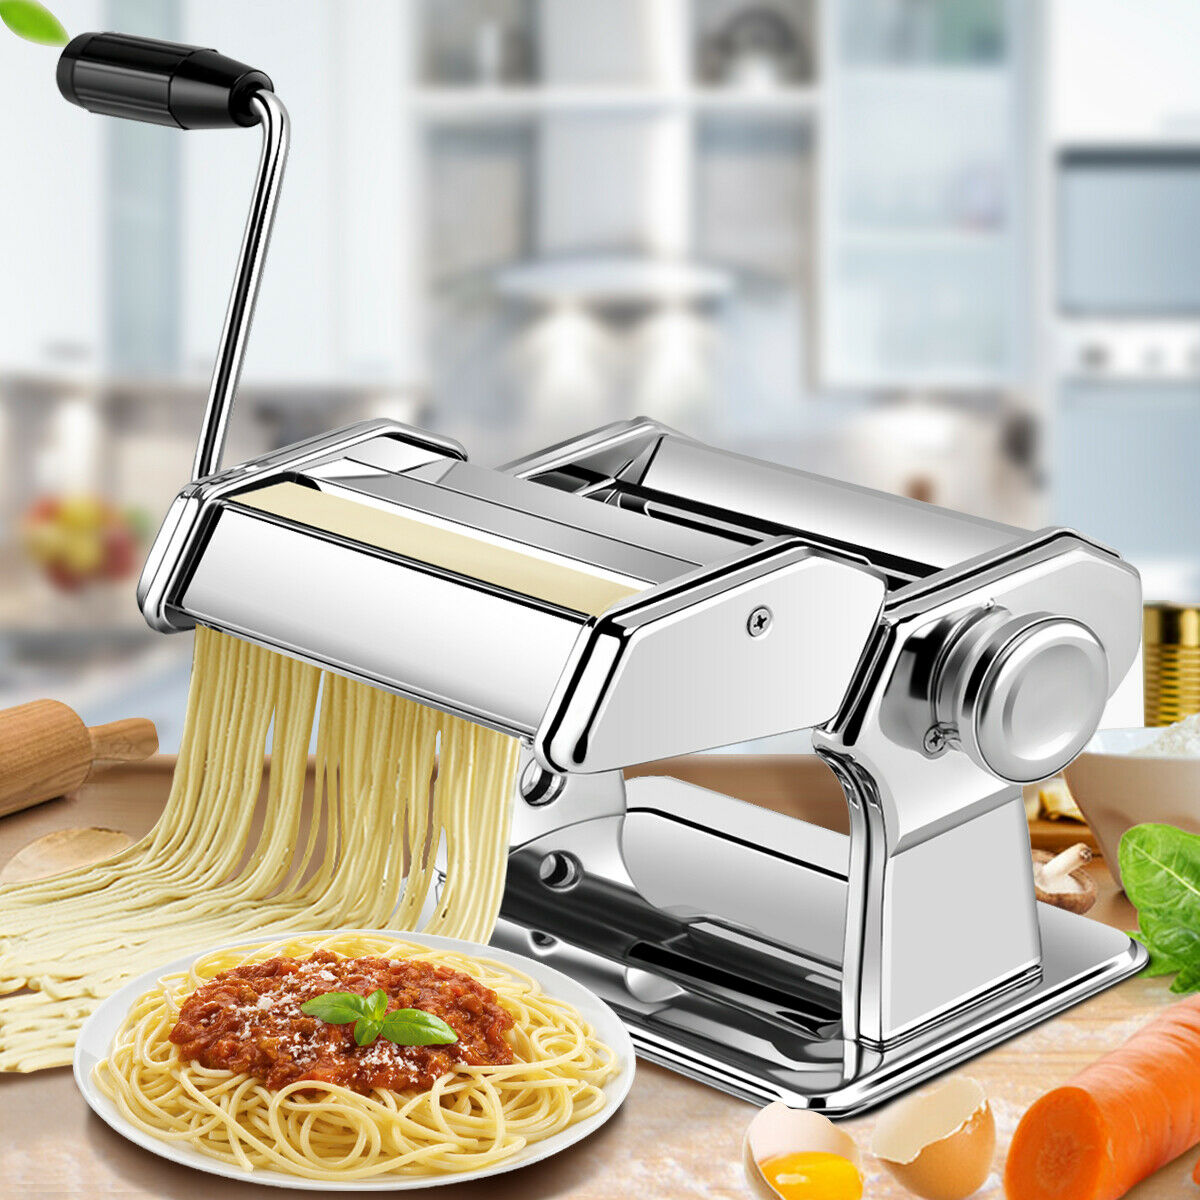 costway 5 in 1 stainless steel pasta lasagna spaghetti tagliatelle ravioli maker machine walmart com